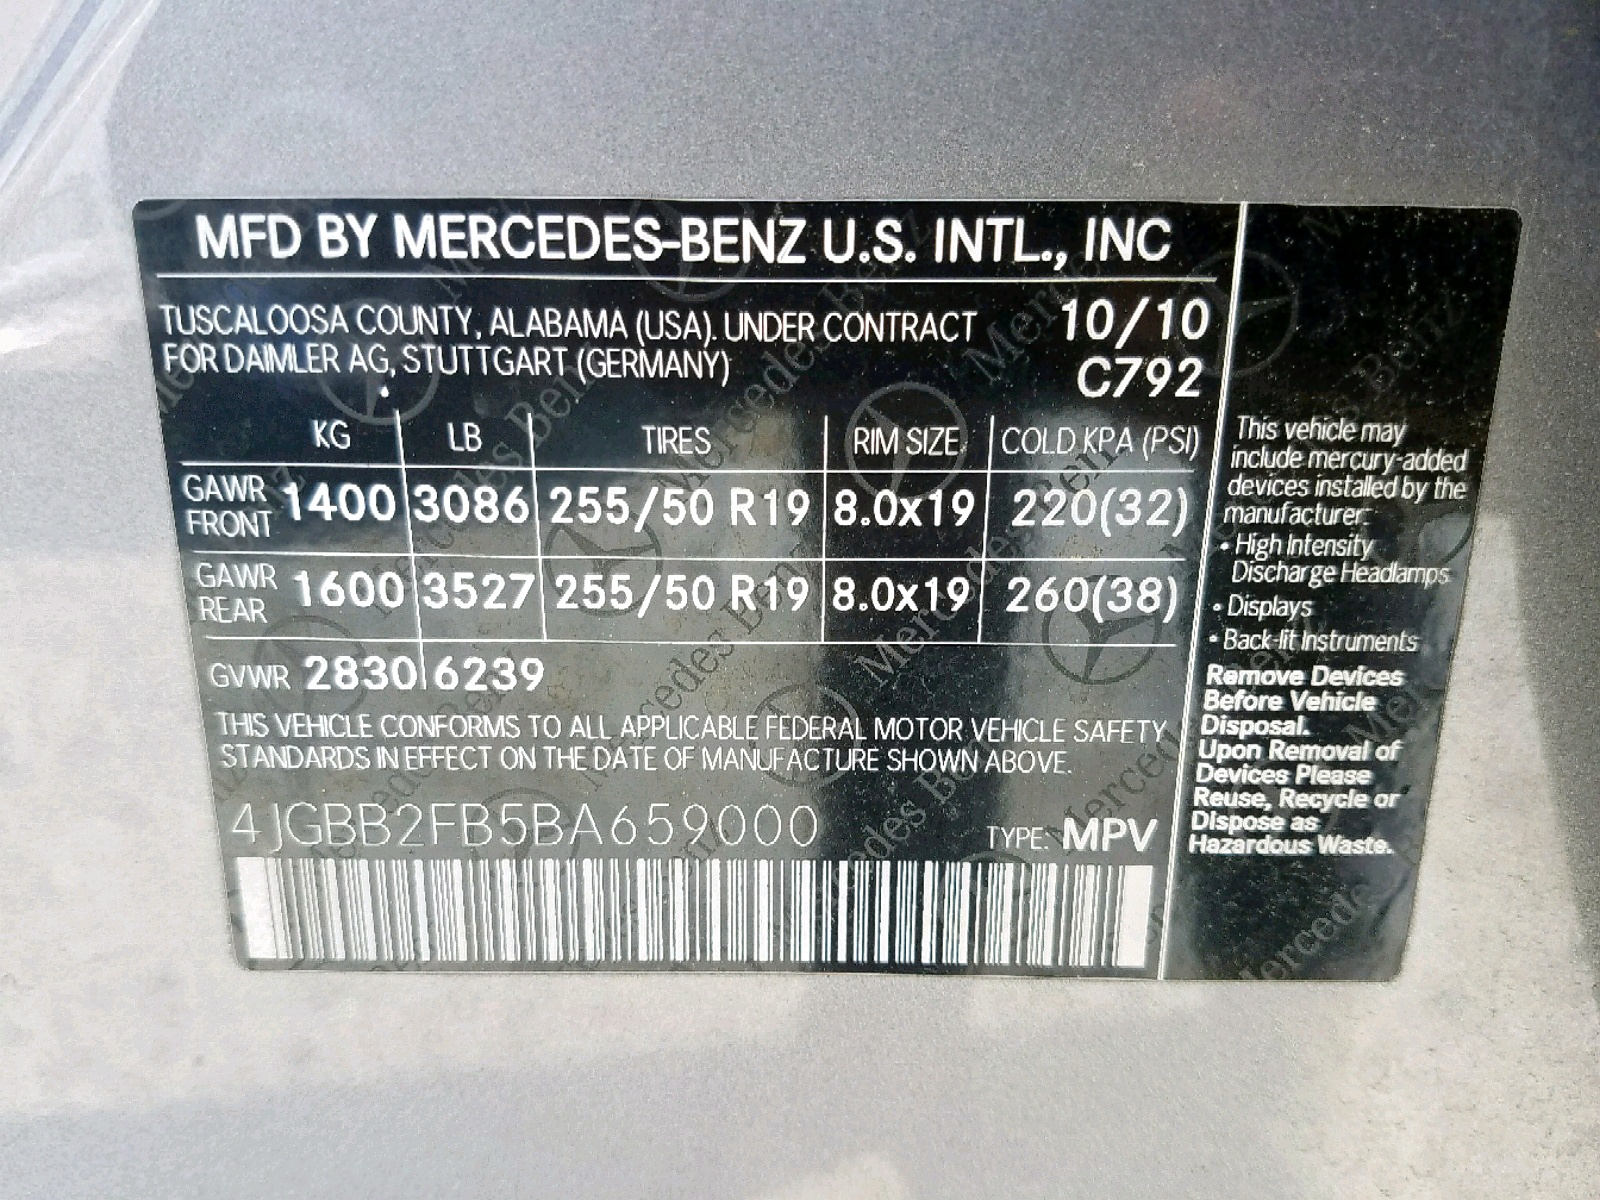 4JGBB2FB5BA659000 - 2011 Mercedes-Benz Ml 350 Blu 3.0L